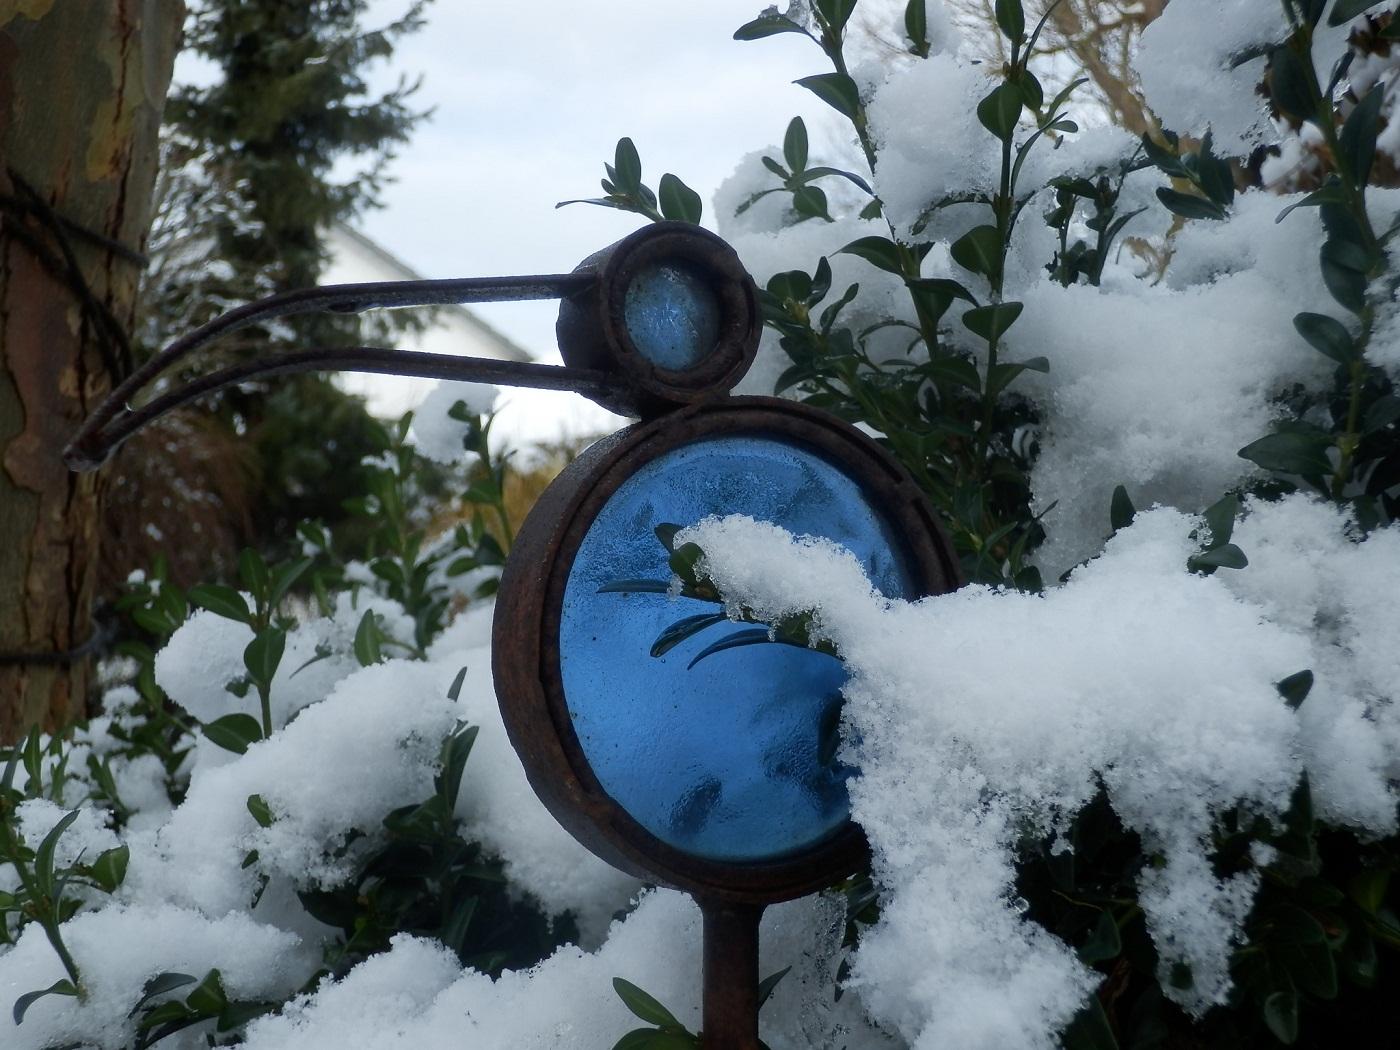 Winter im pflanzen art garten